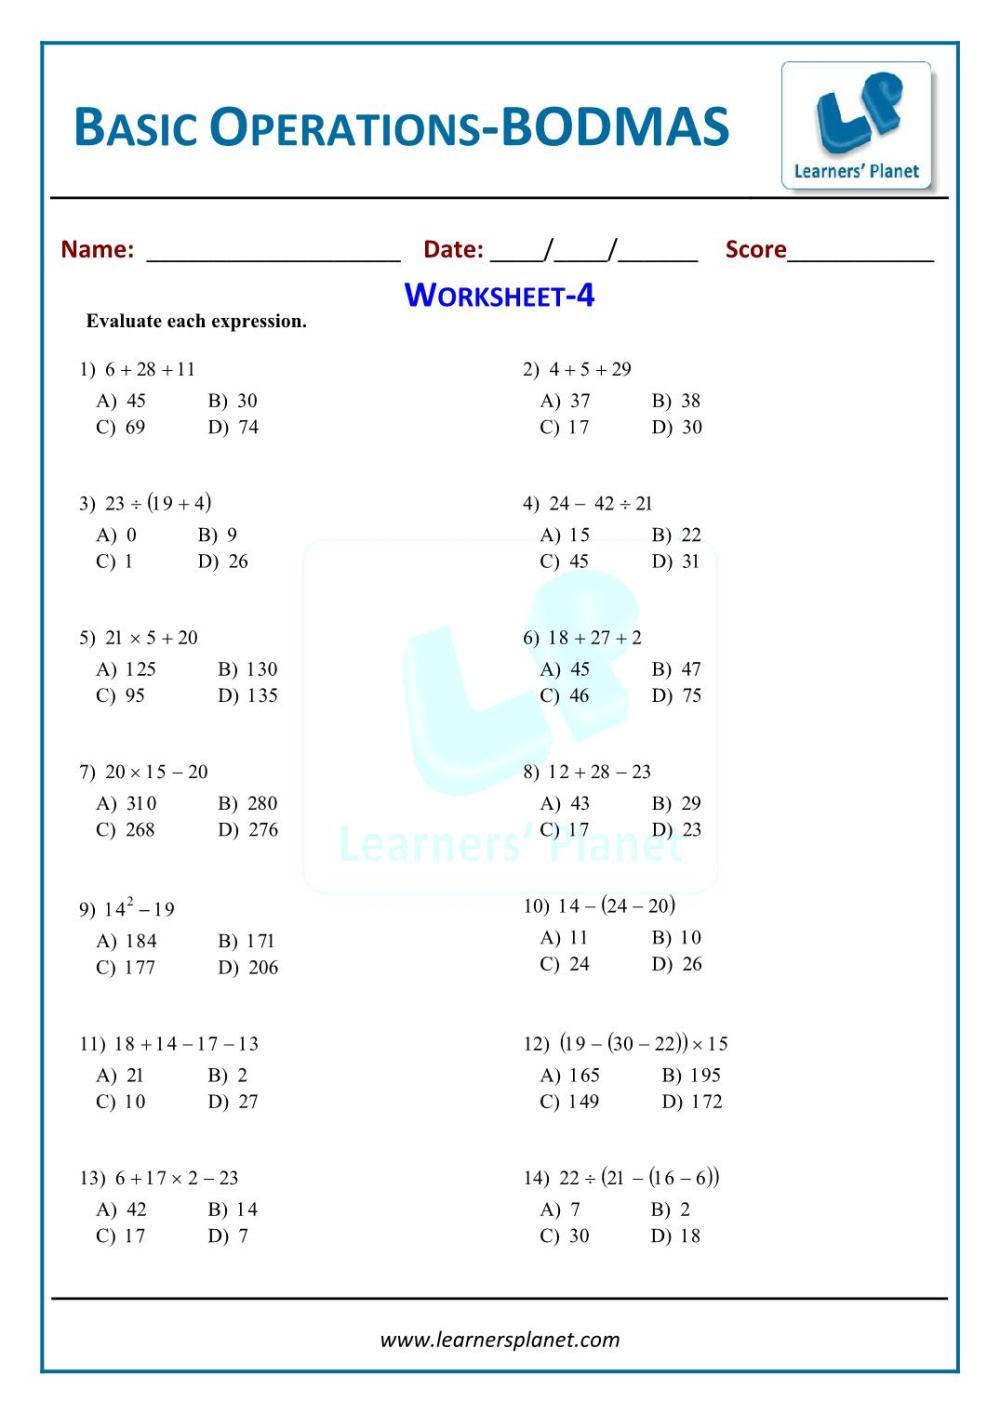 medium resolution of BODMAS practice sheets 6th grade math worksheets on basic operationsBODMAS  practice sheets 6th grade math worksheets on basic operations